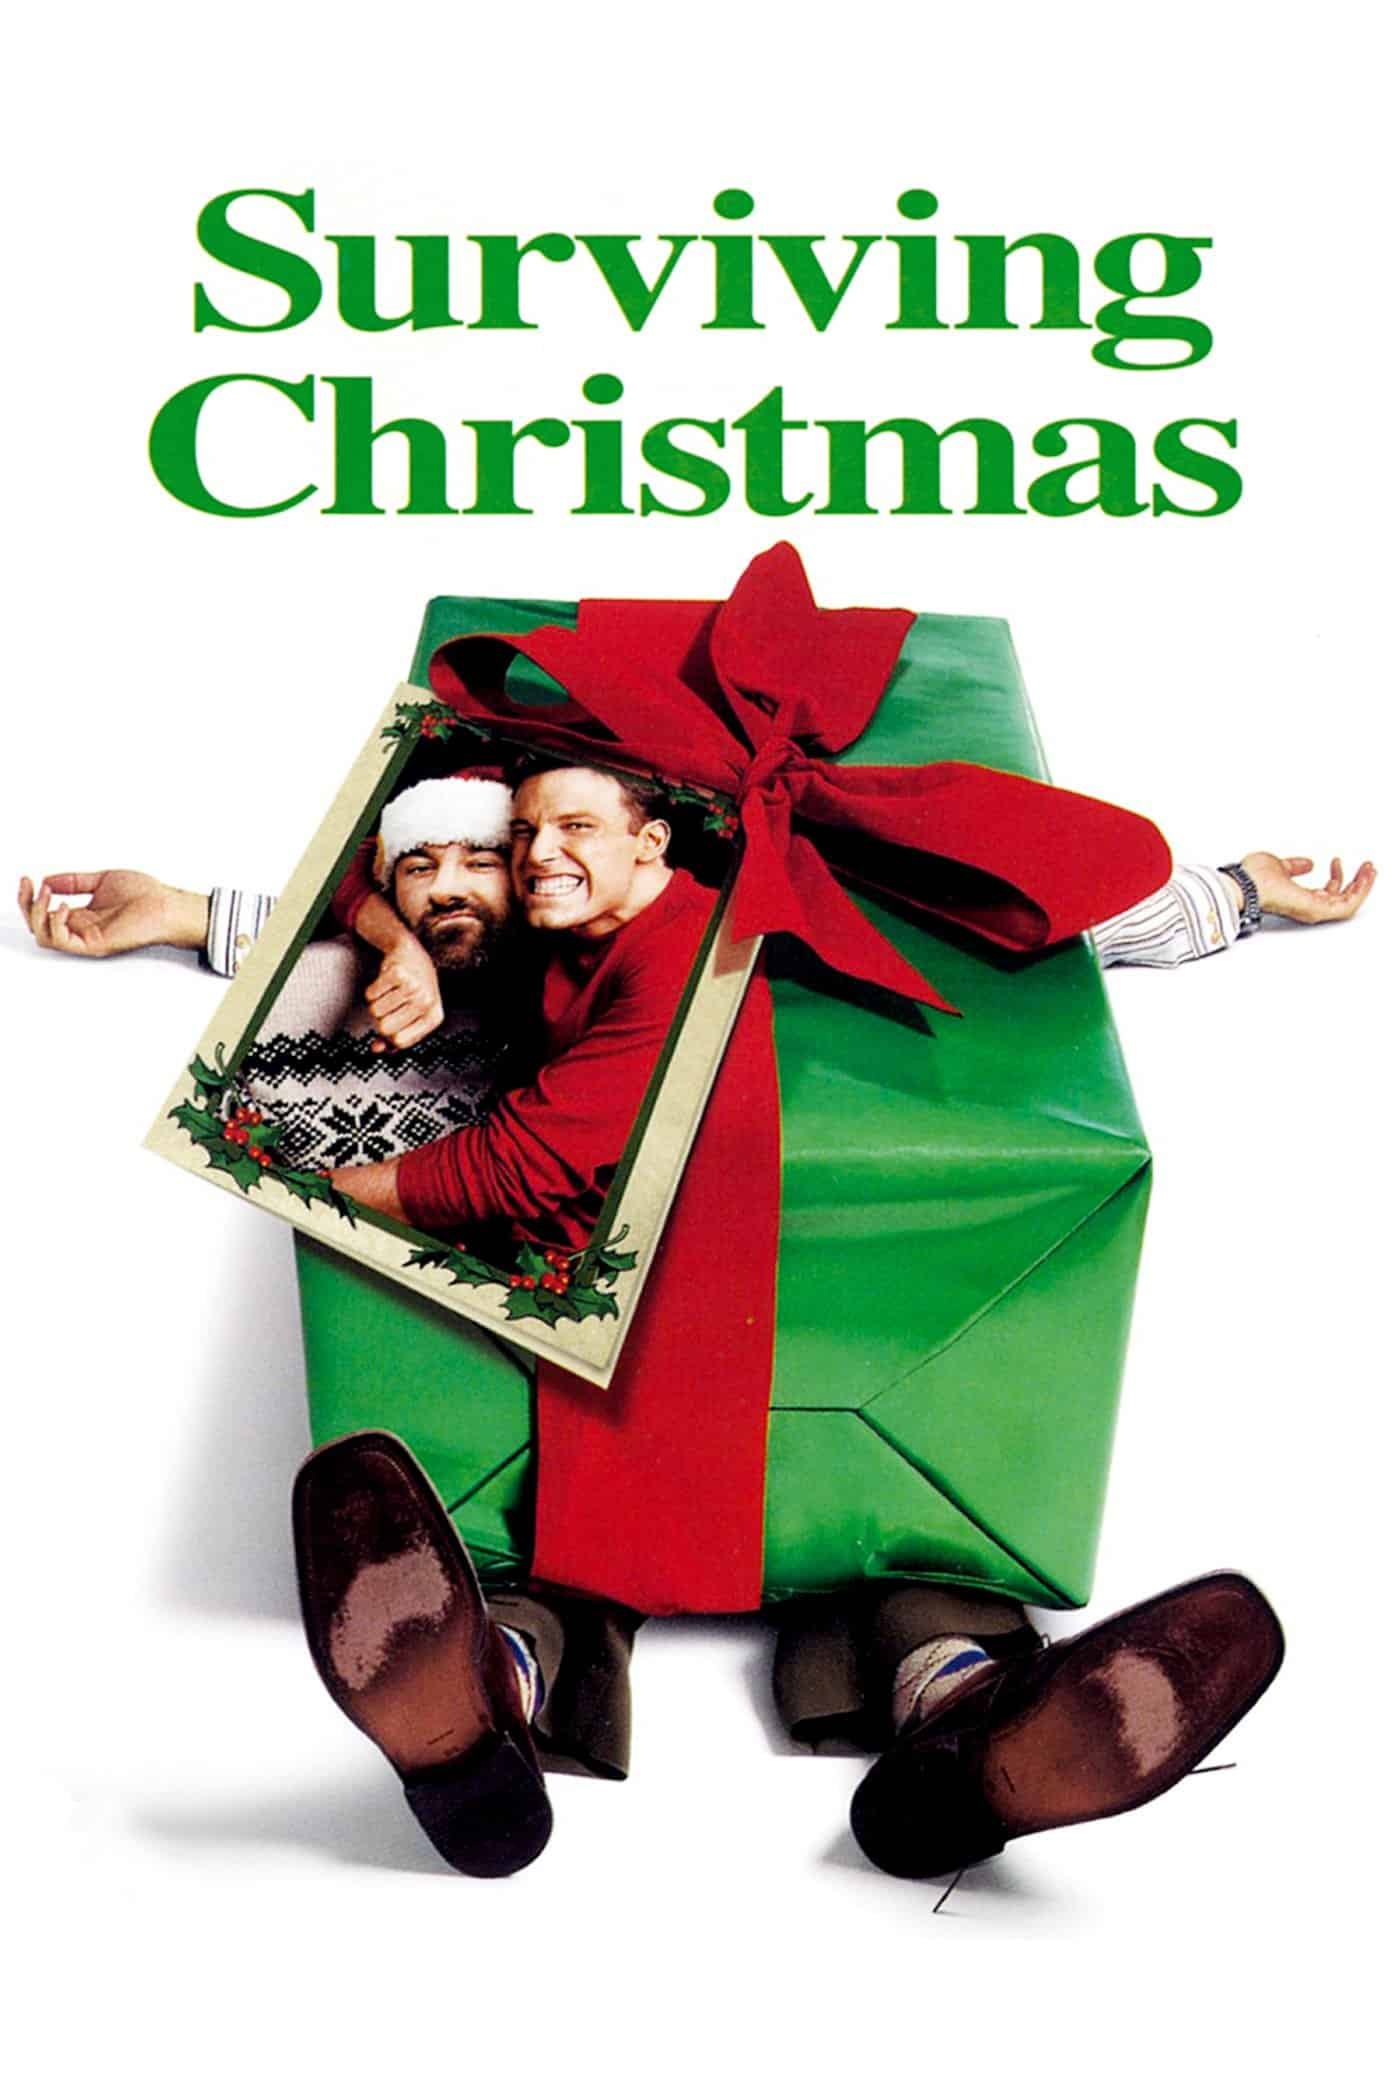 Surviving Christmas, 2004